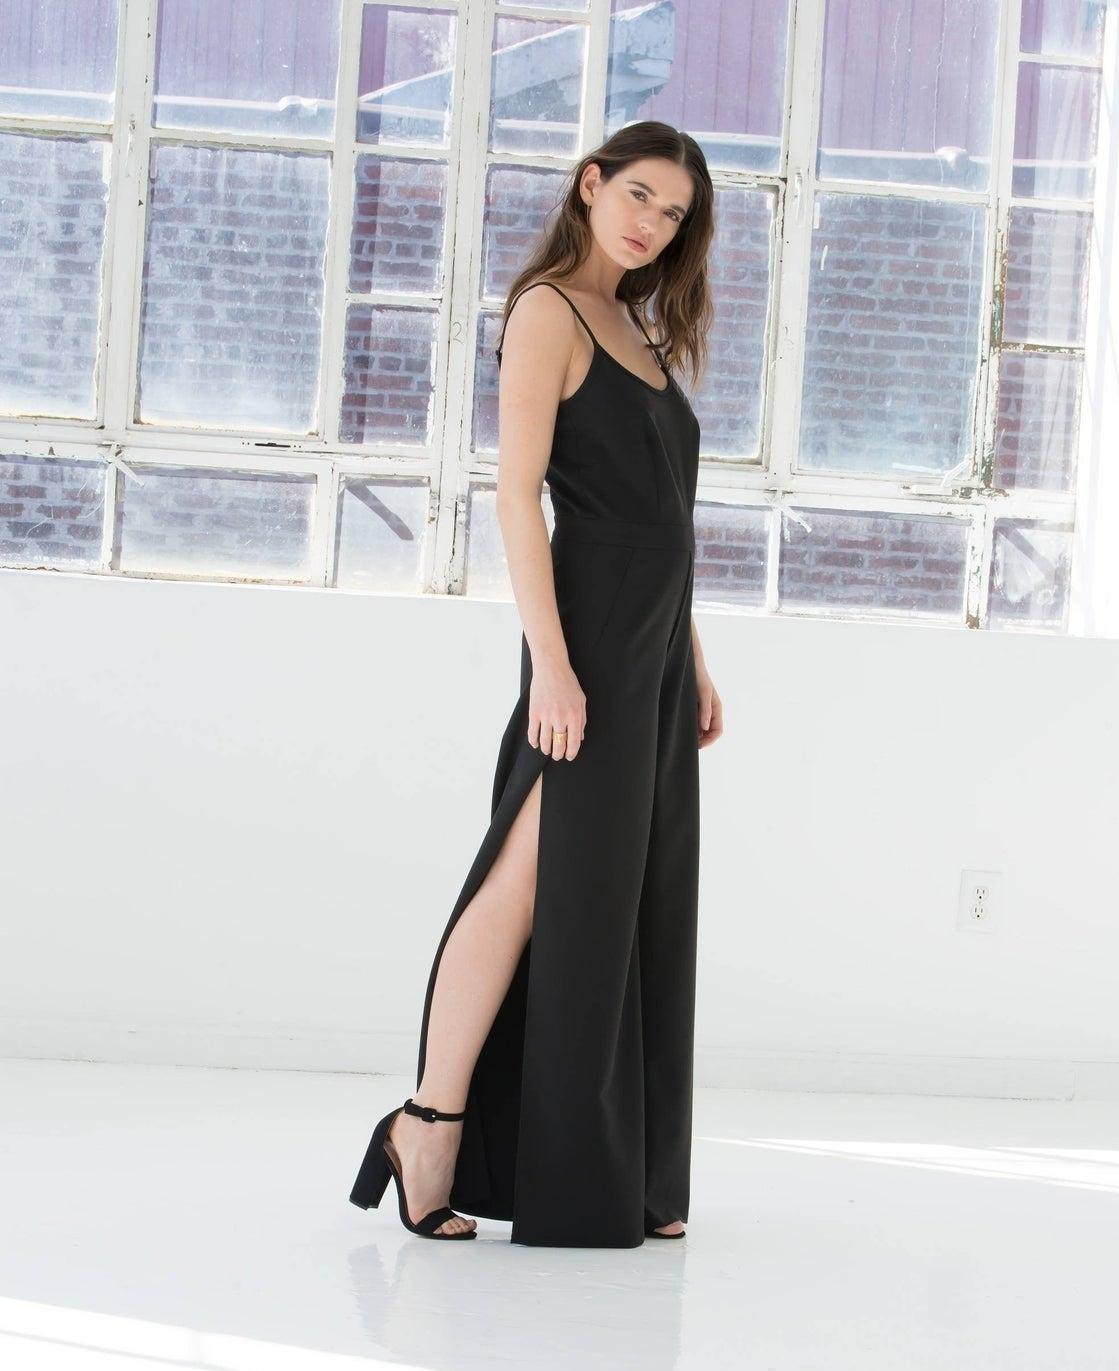 A model wearing the black spaghetti strap jumpsuit